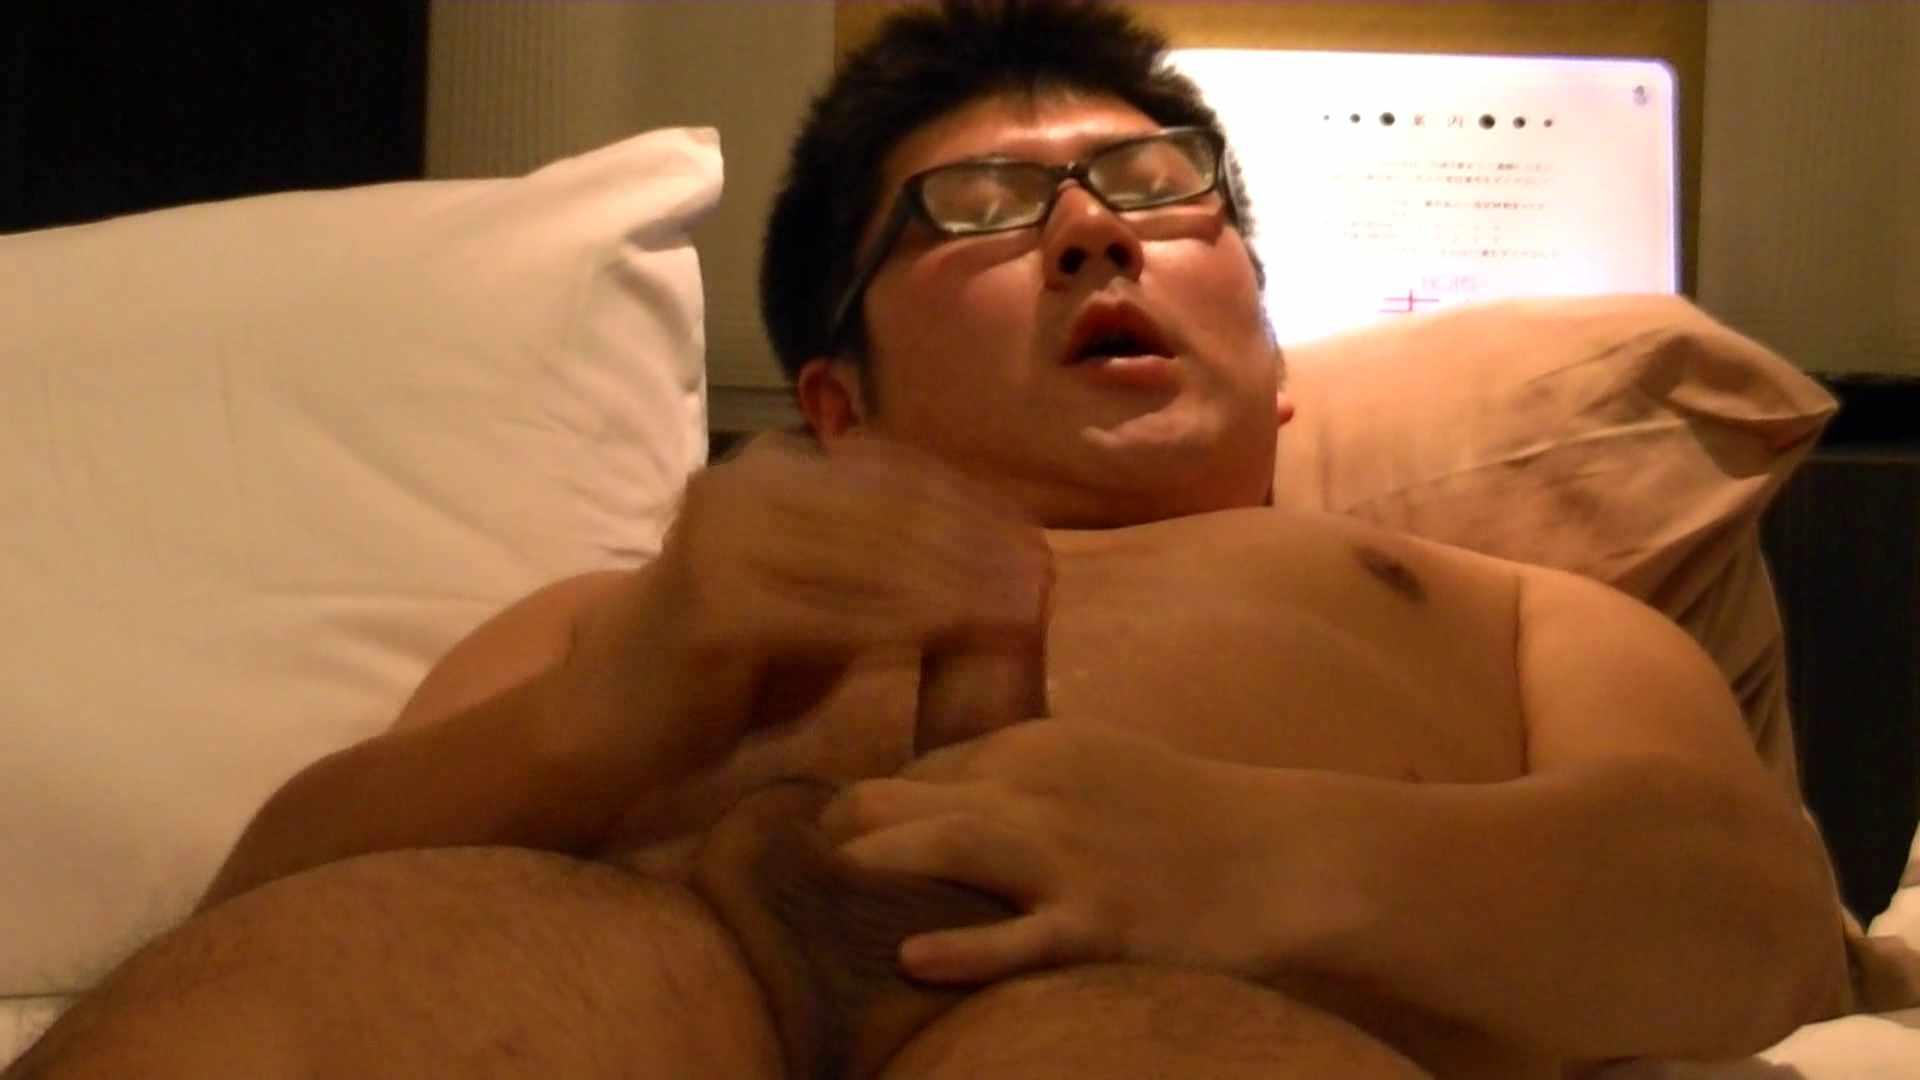 Mr.オナックスさん投稿!HD 貴方のオナニー三万円で撮影させてください。VOL.03 後編 完全無修正版  106枚 12